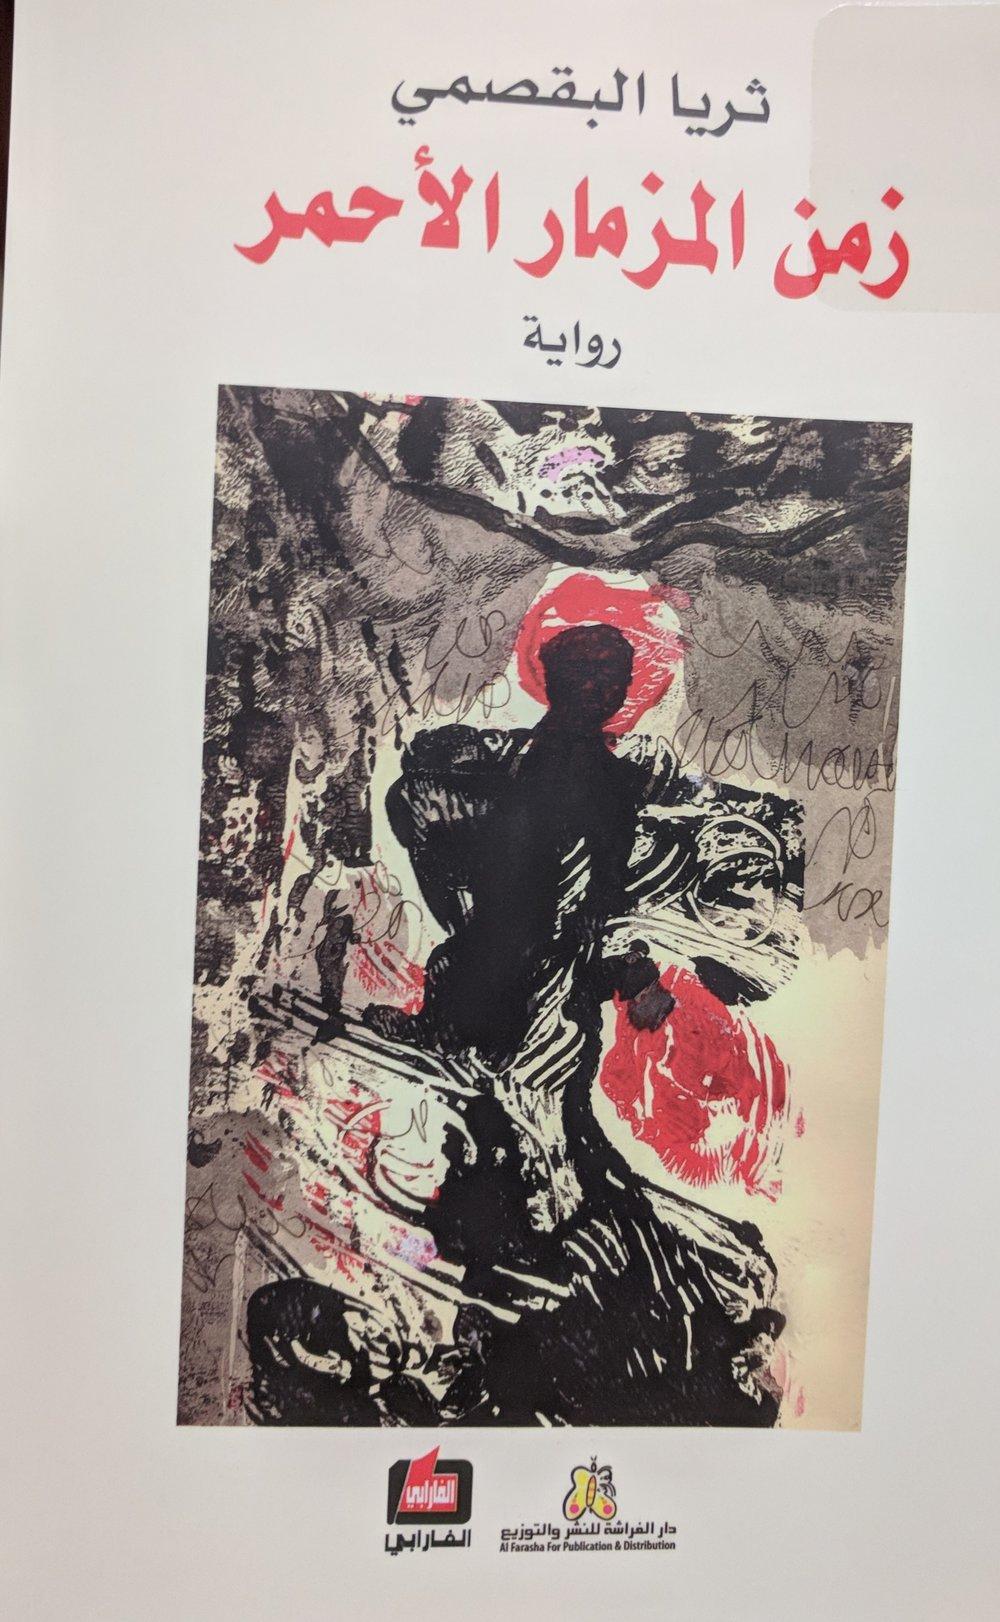 Thurayyā al-Baqṣamī,Zaman al-mizmār al-aḥmar(Bayrūt: Dār al-Farāshah li-l-Nashr wa-l-Tawzīʻ; Dawlat al-Kuwayt: Dār al-Farāshah, 2012)